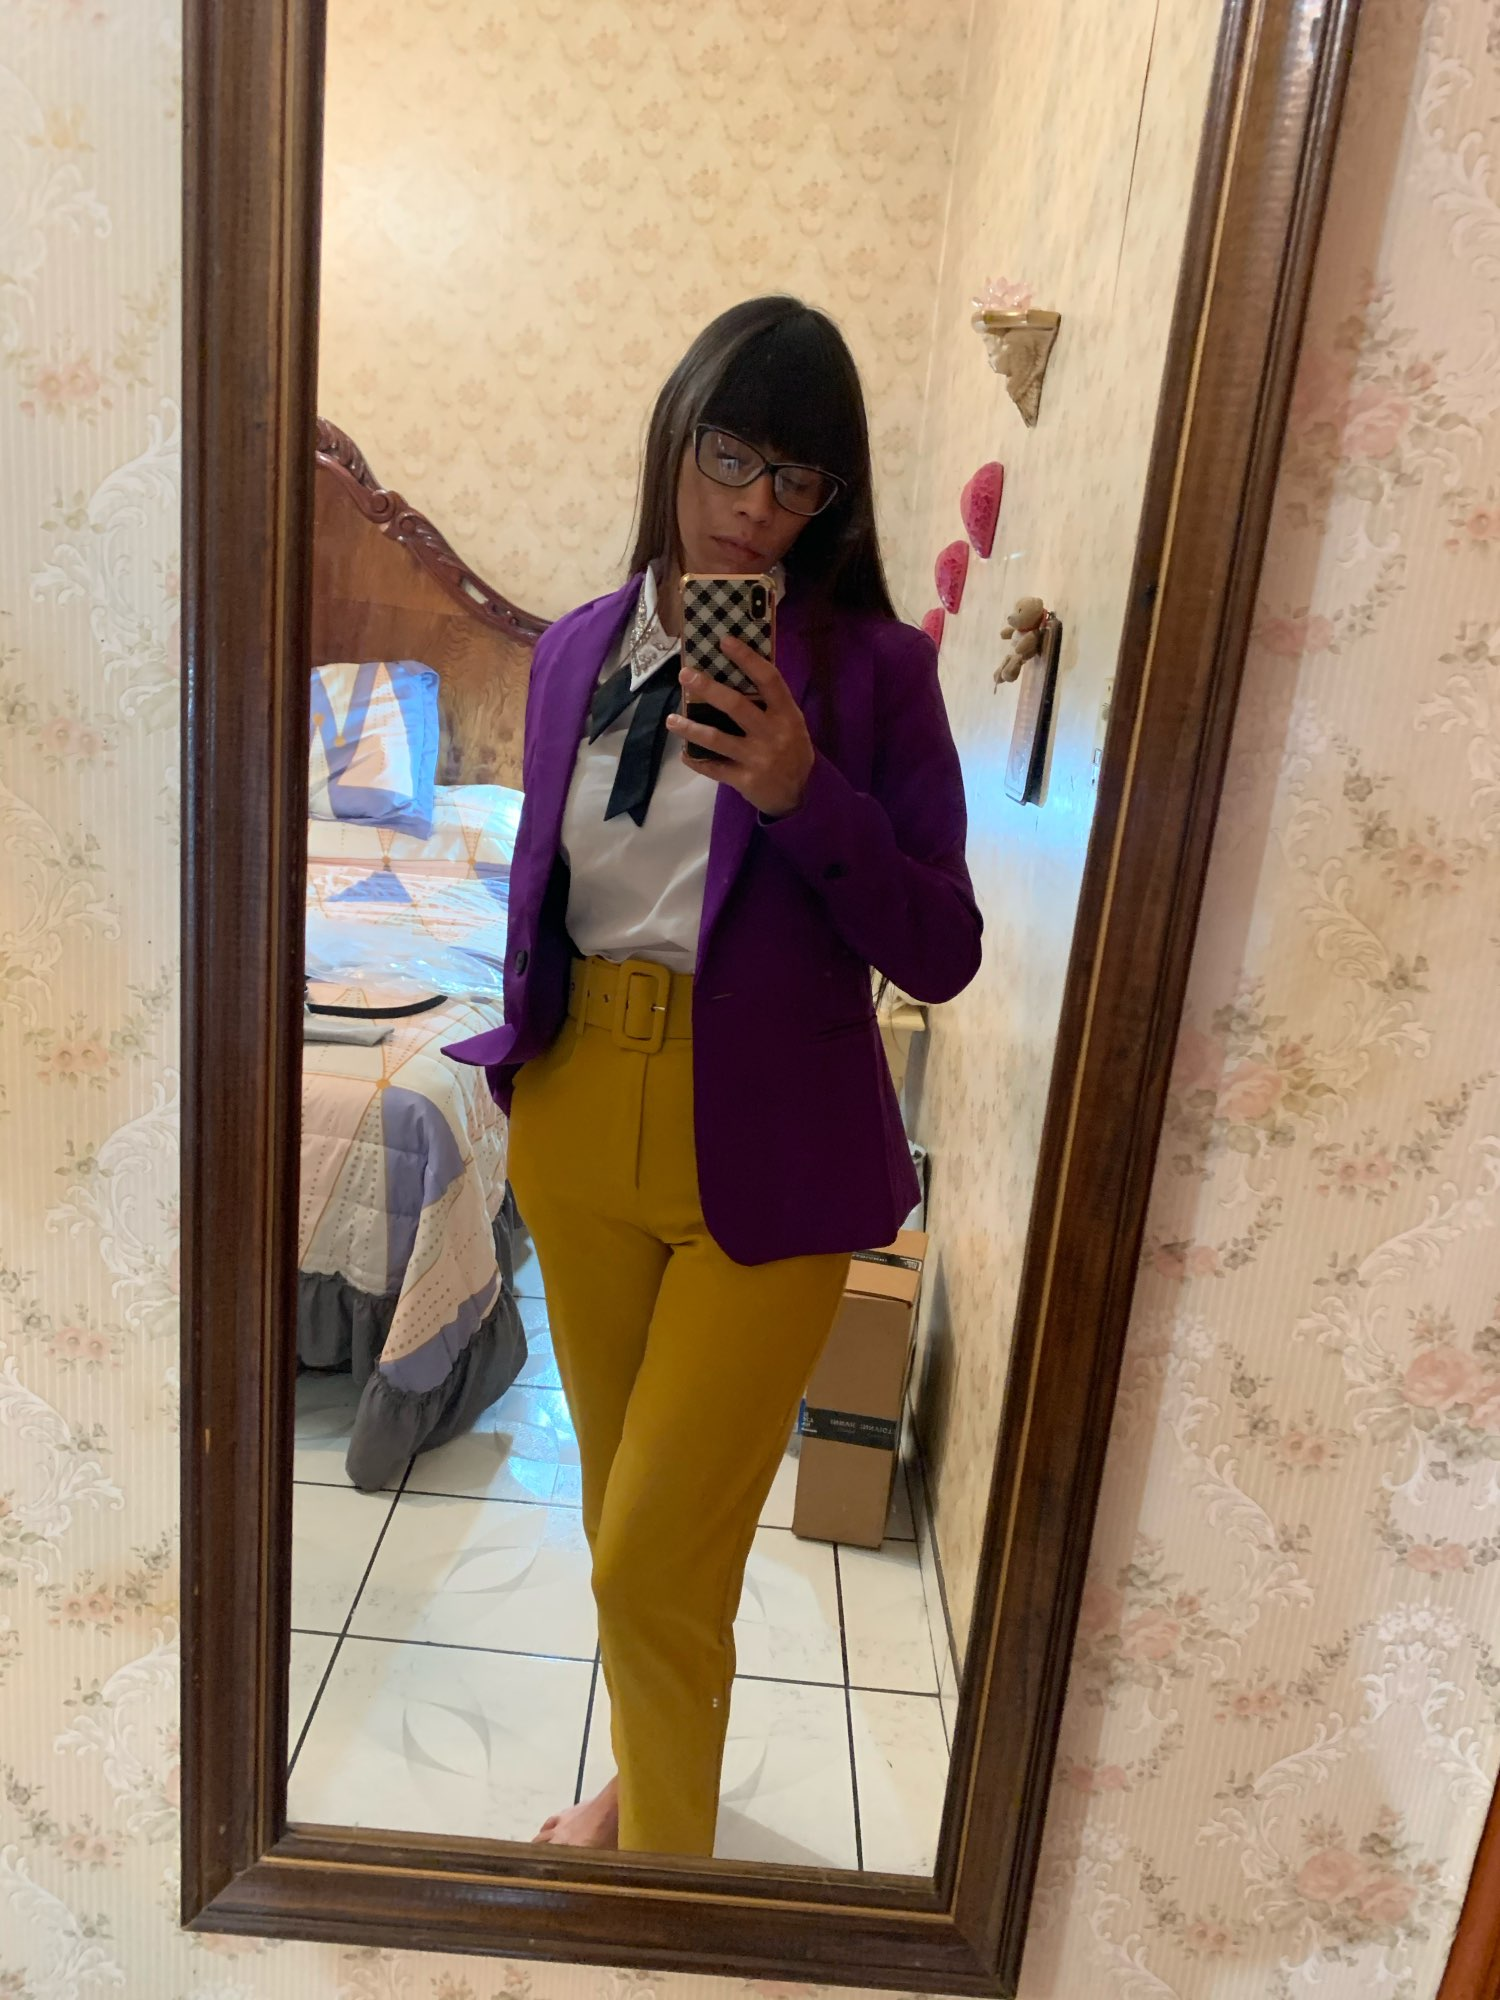 KPYTOMOA Women 2020 Fashion Office Wear Basic Blazer Coat Vintage Long Sleeve Pockets Female Outerwear Chic Tops reviews №1 798787